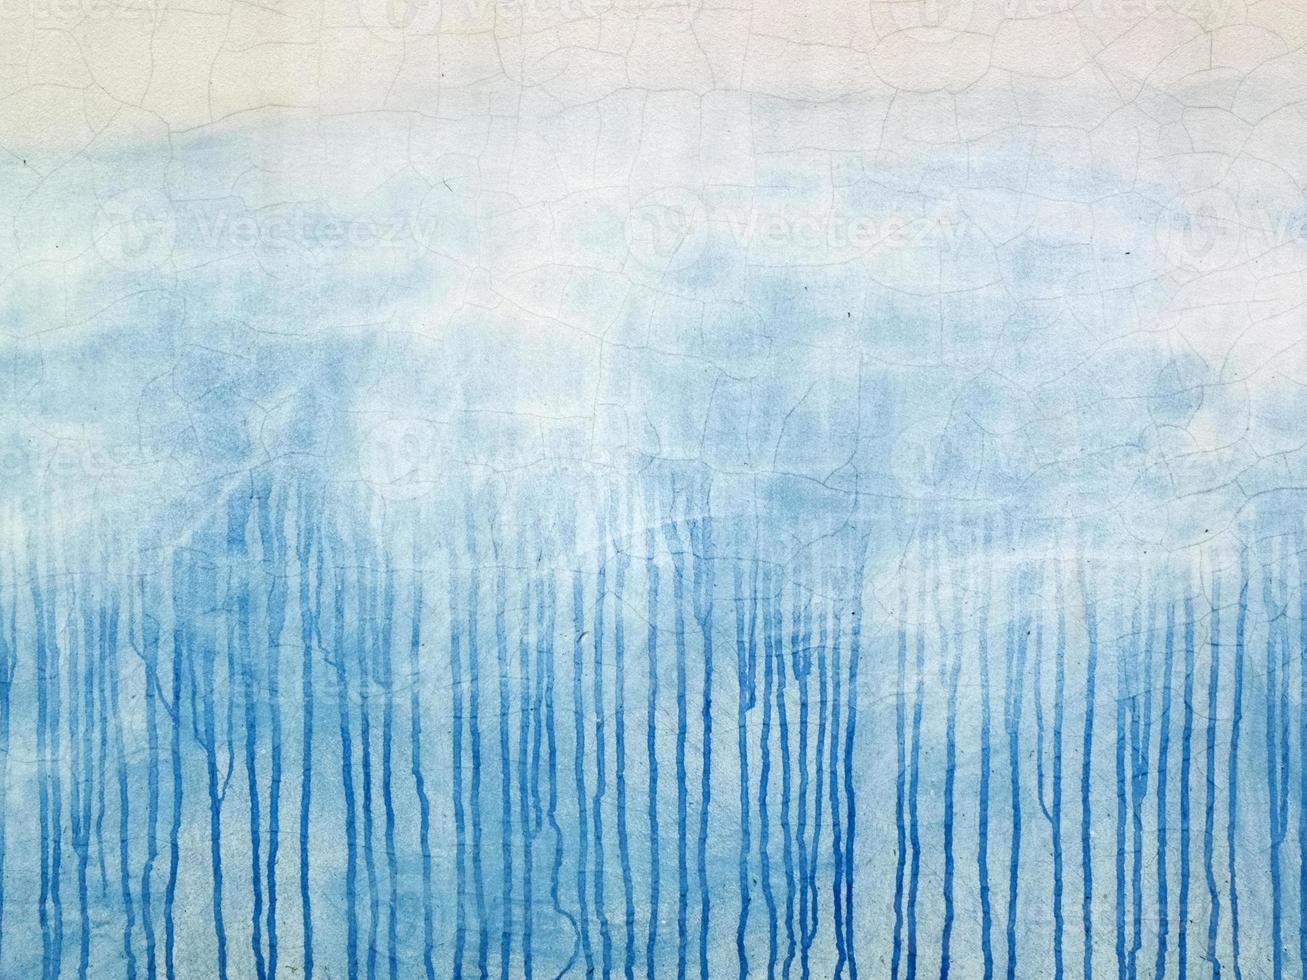 vernice blu versata sulla facciata bianca screpolata foto